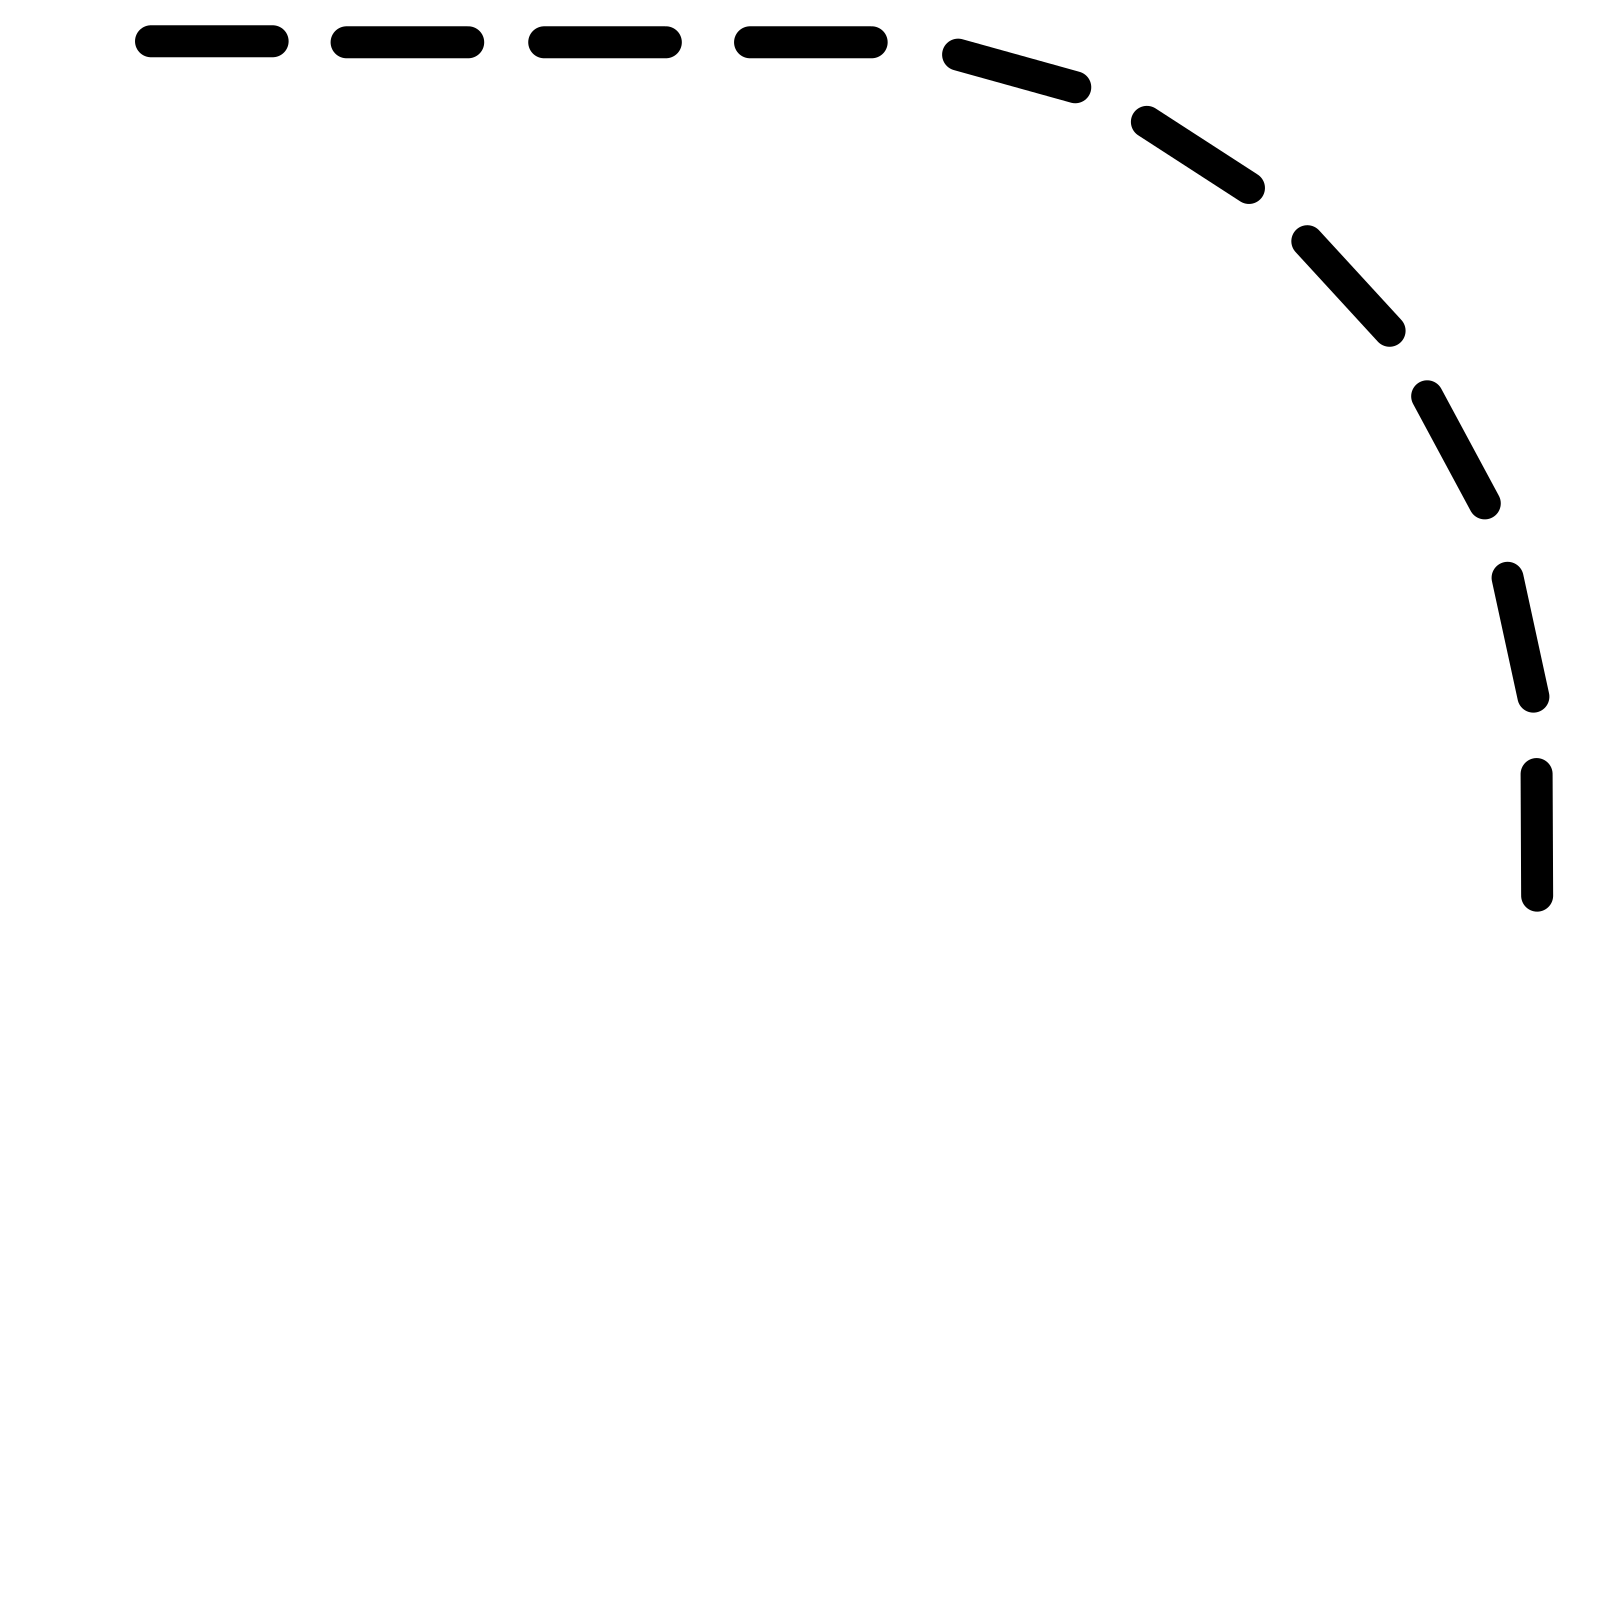 Line 7 SVG Clip arts